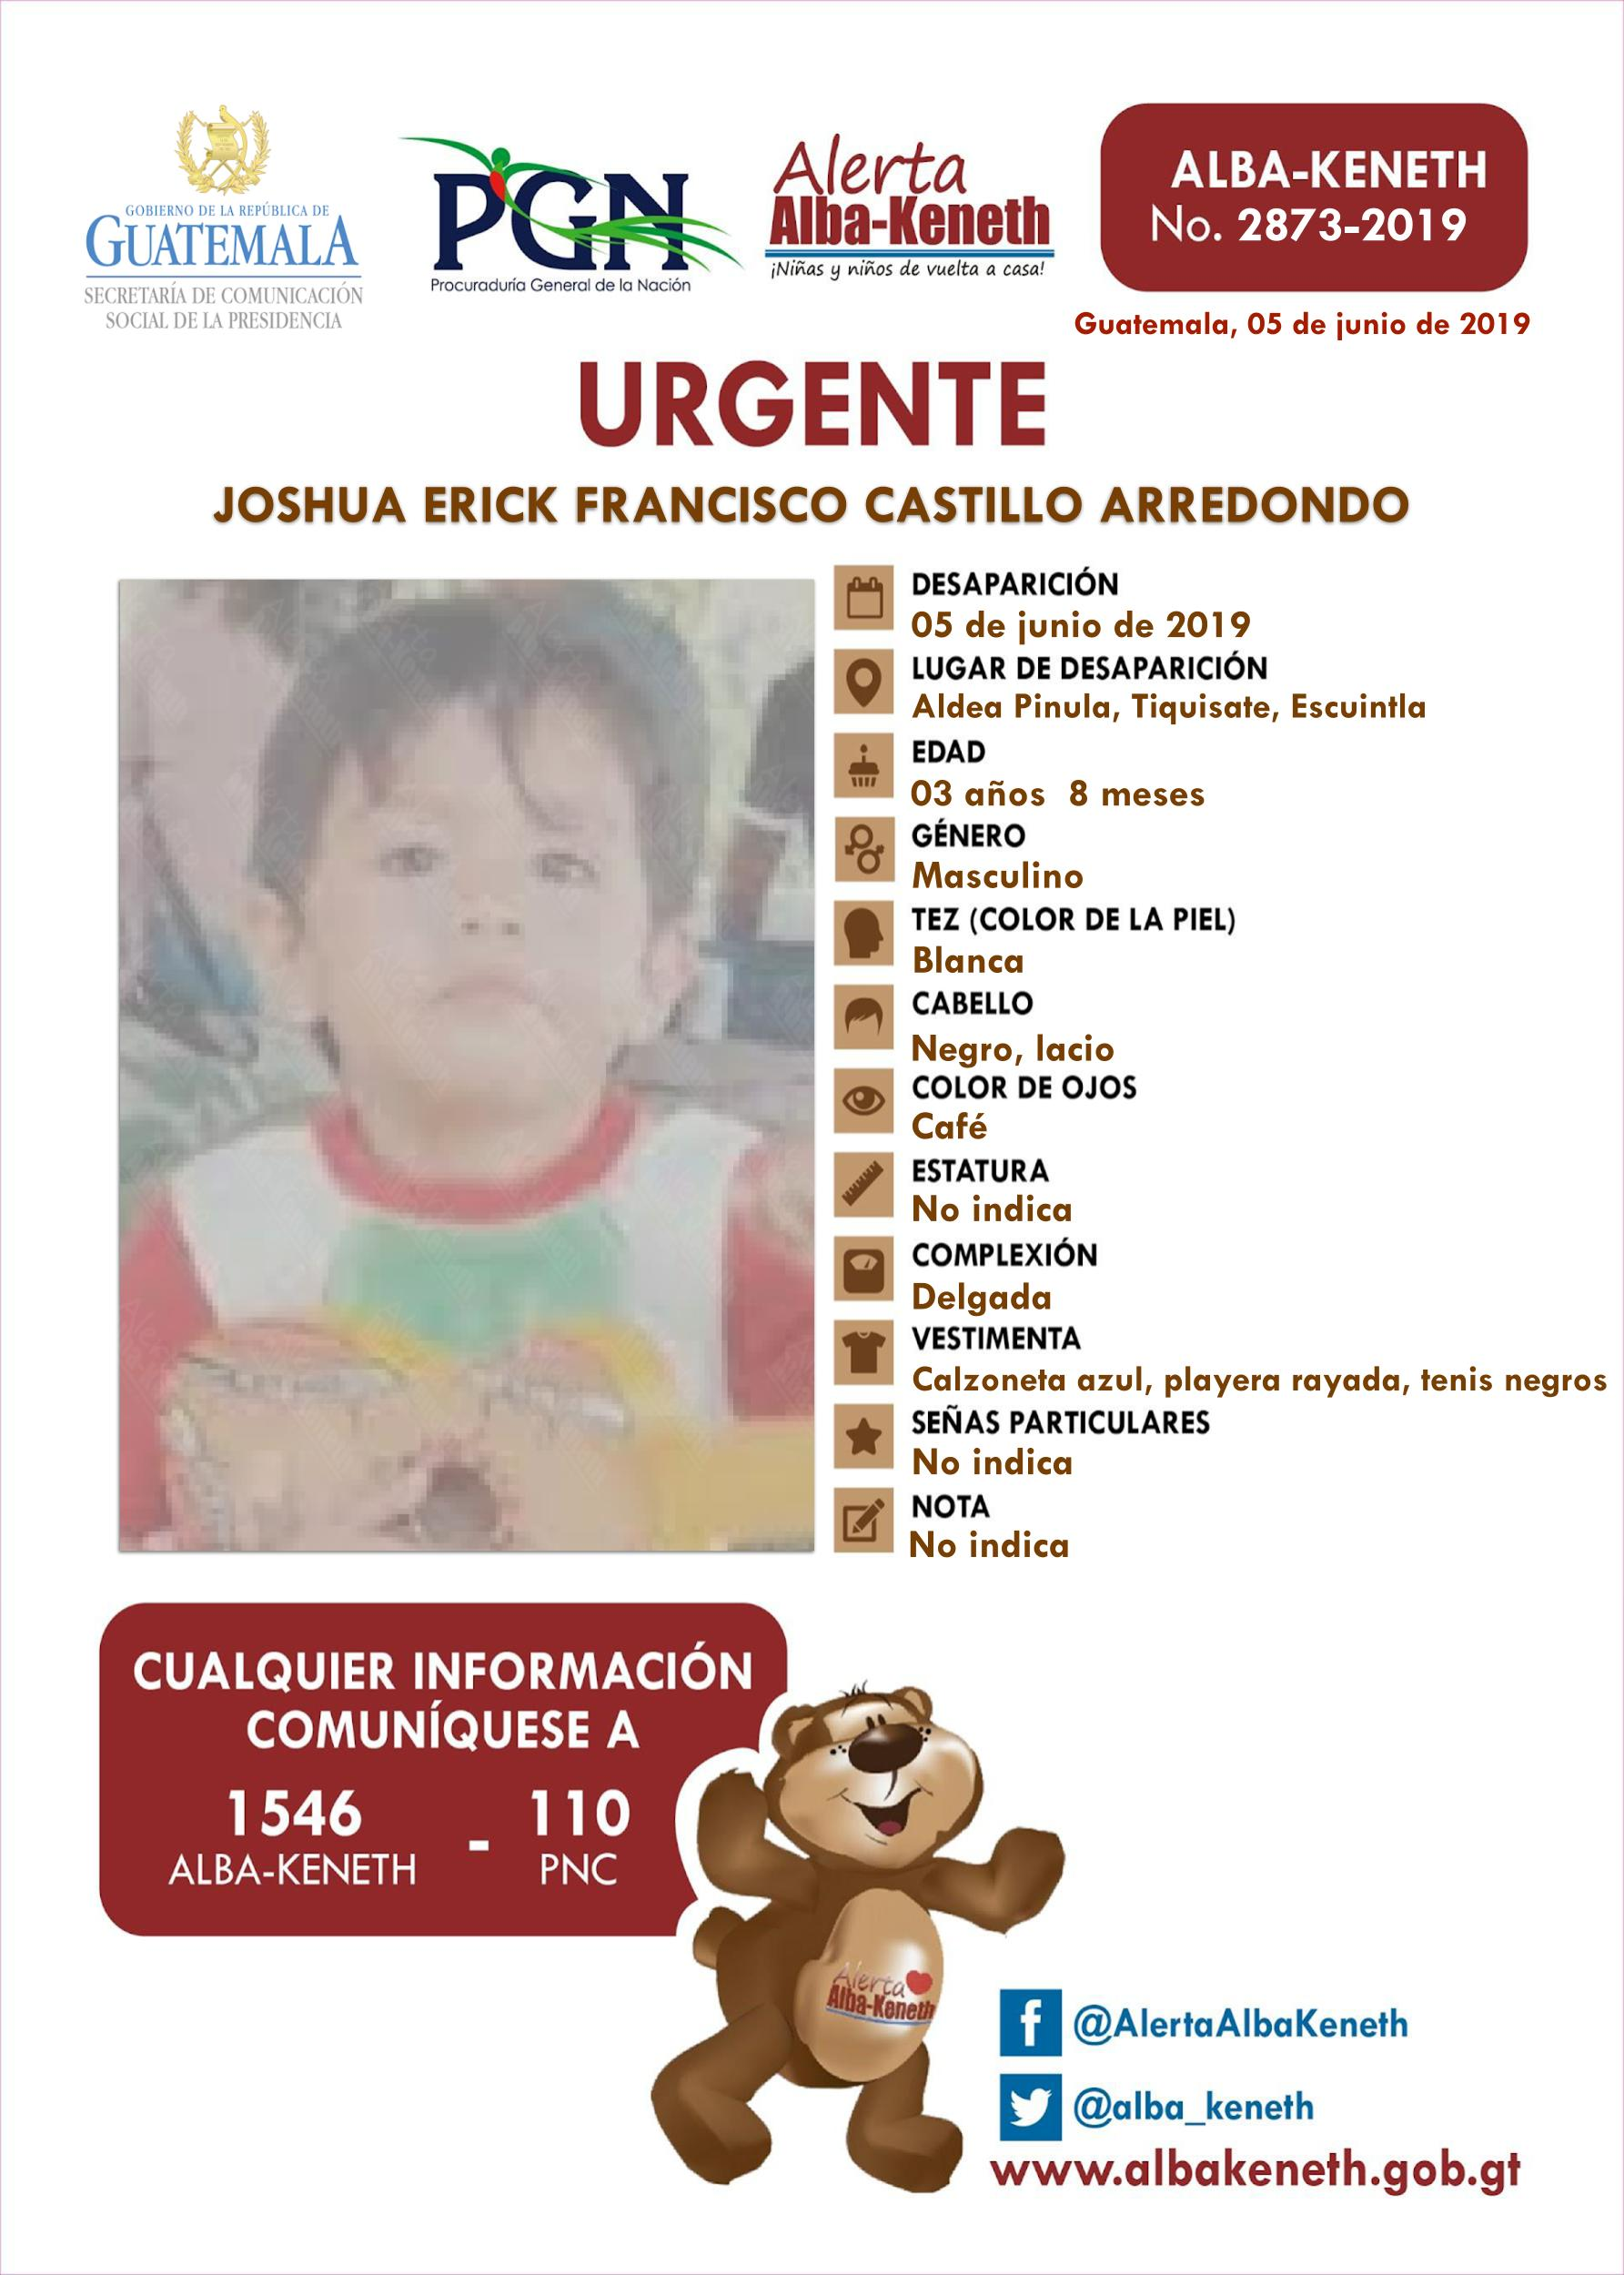 Joshua Erick Francisco Castillo Arredondo